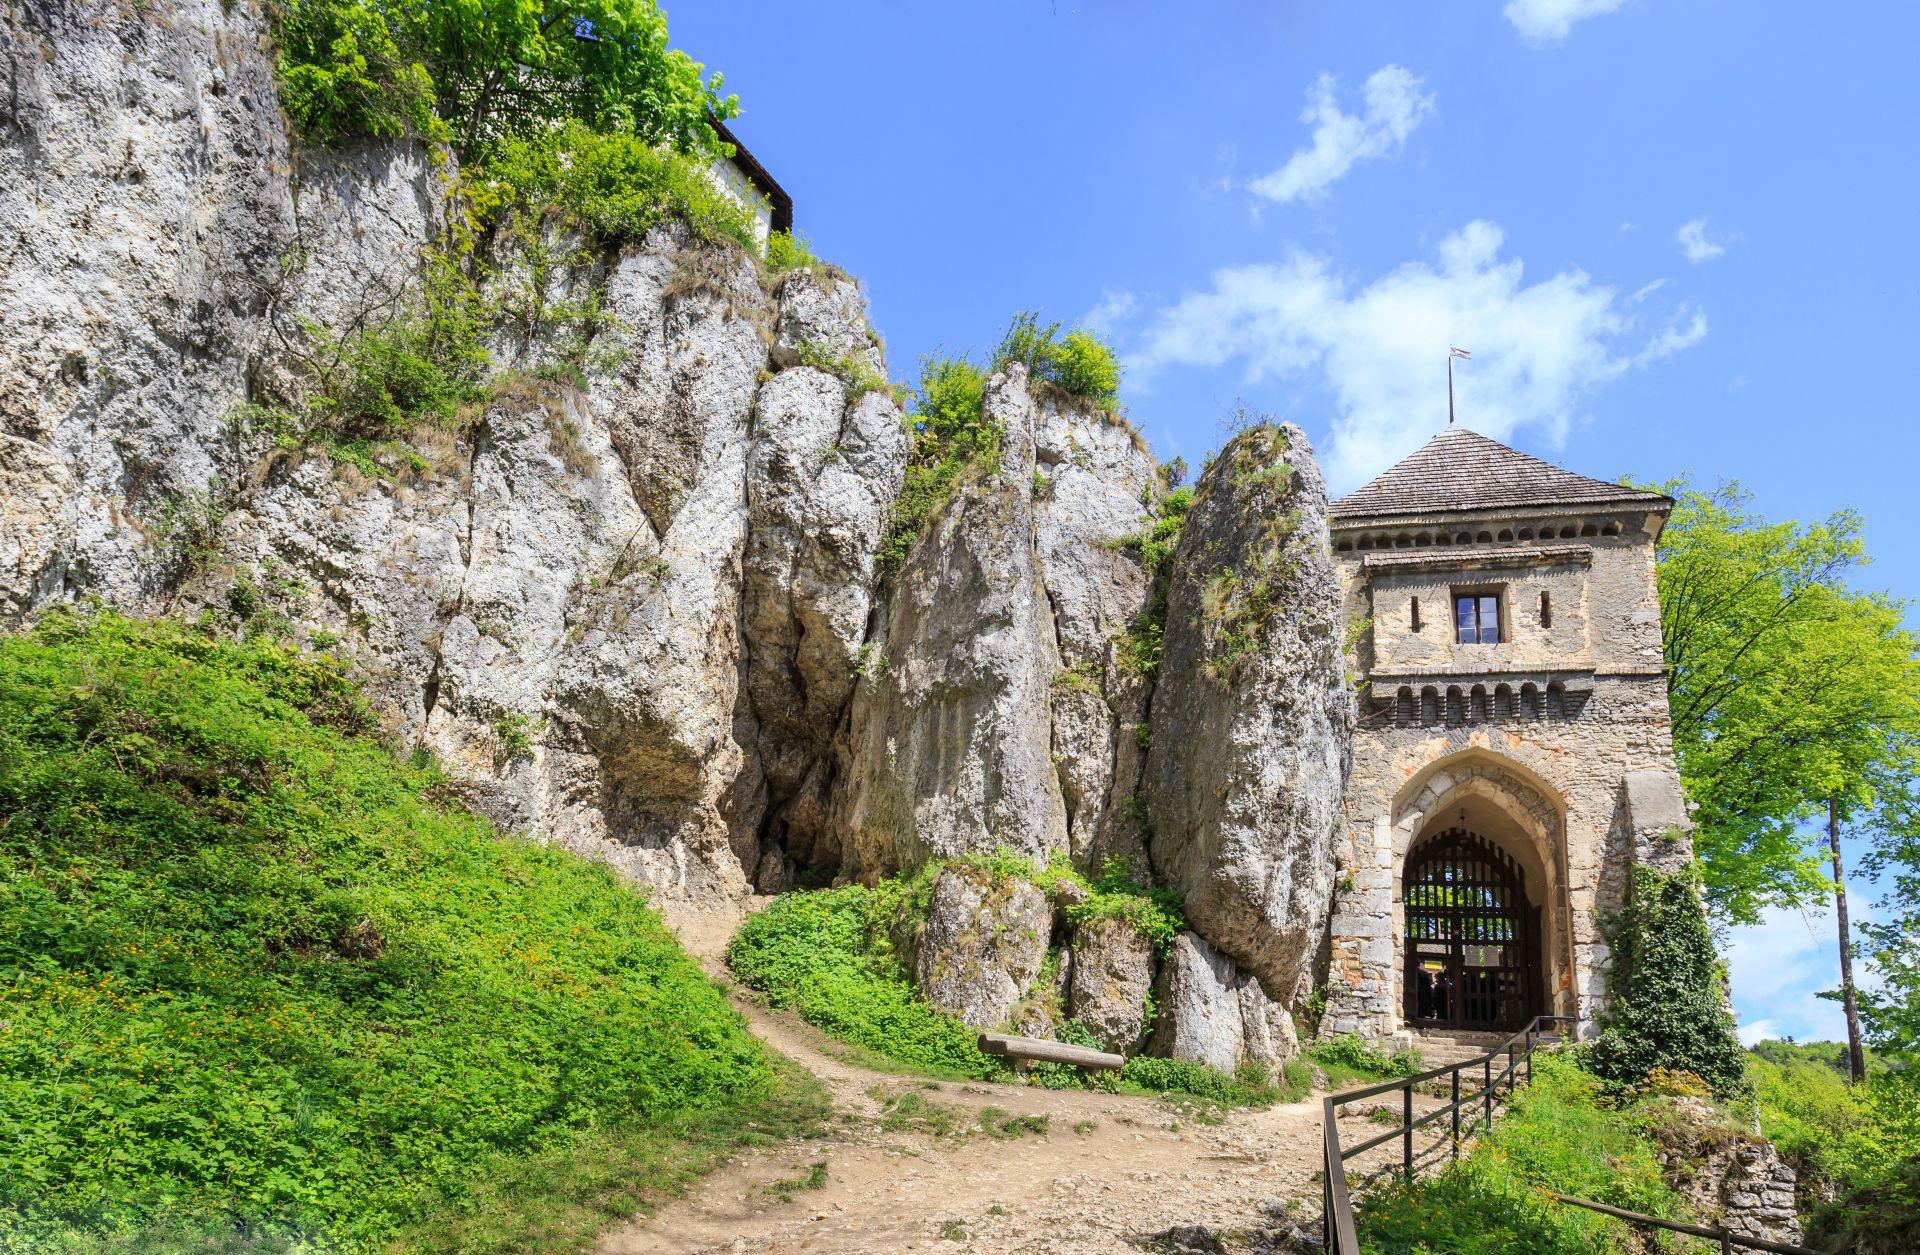 The entrance gate to the castle Castle in Ojcow, nearby Krakow